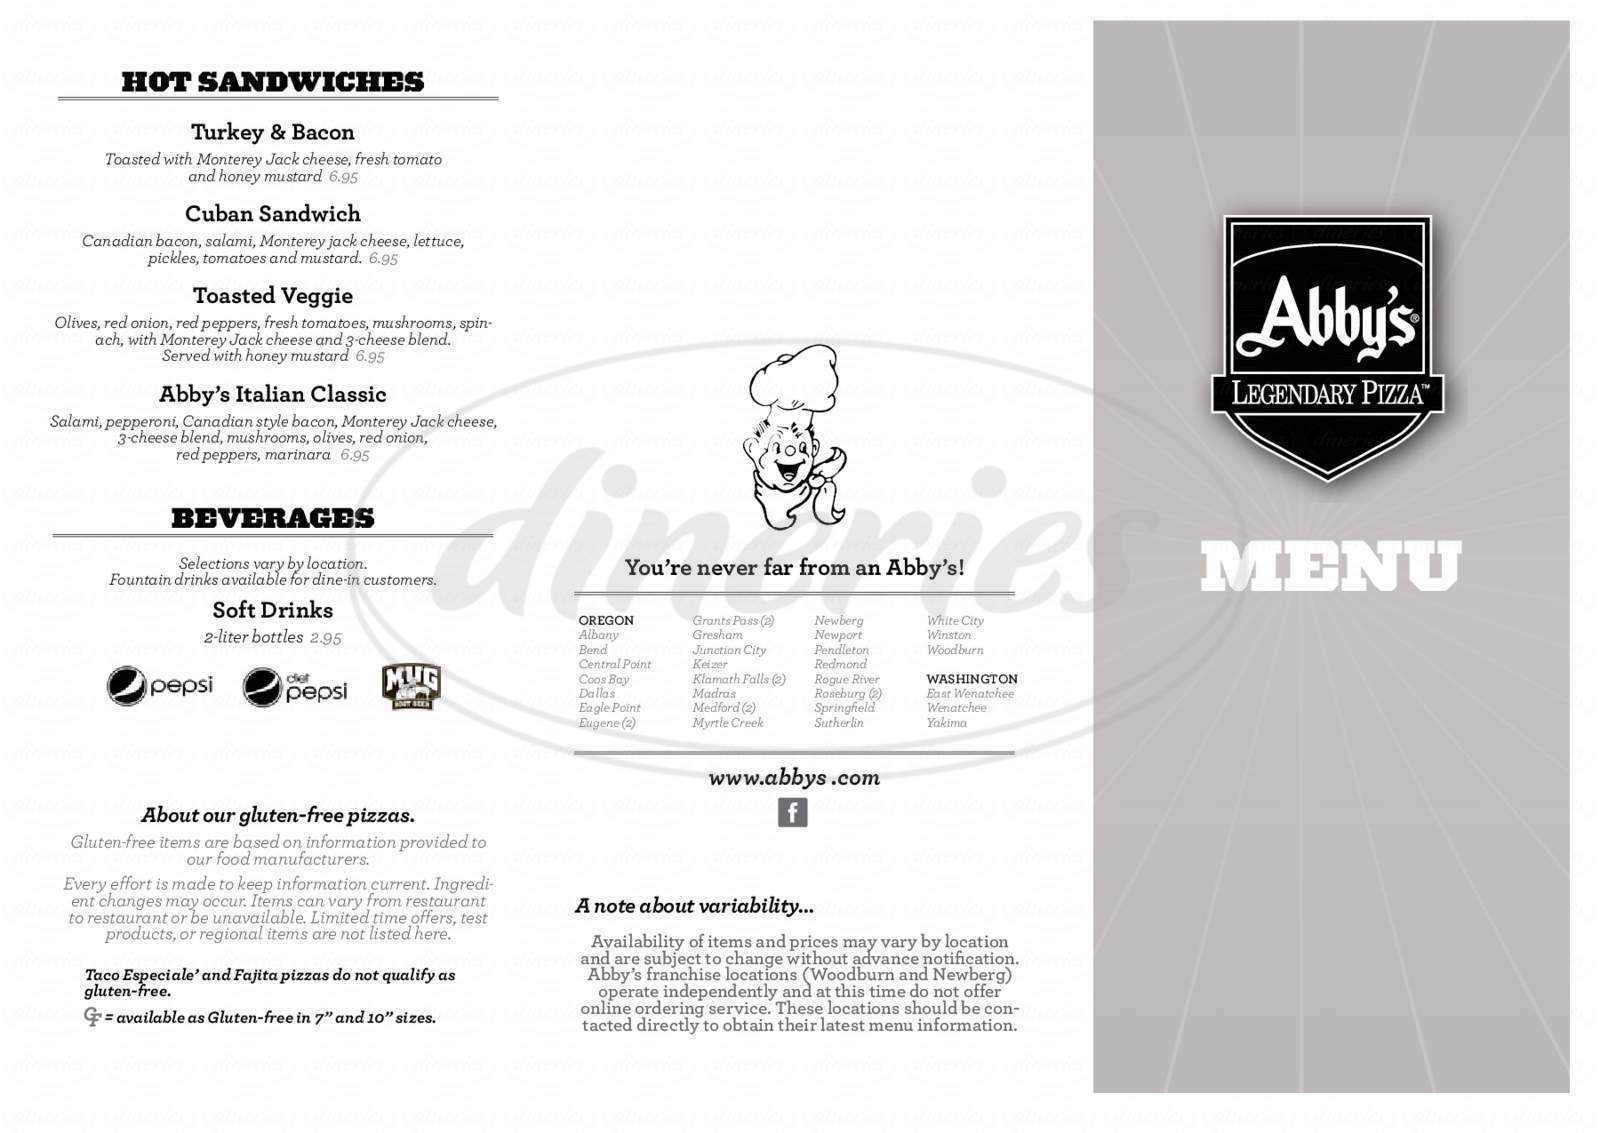 menu for Abby's Legendary Pizza